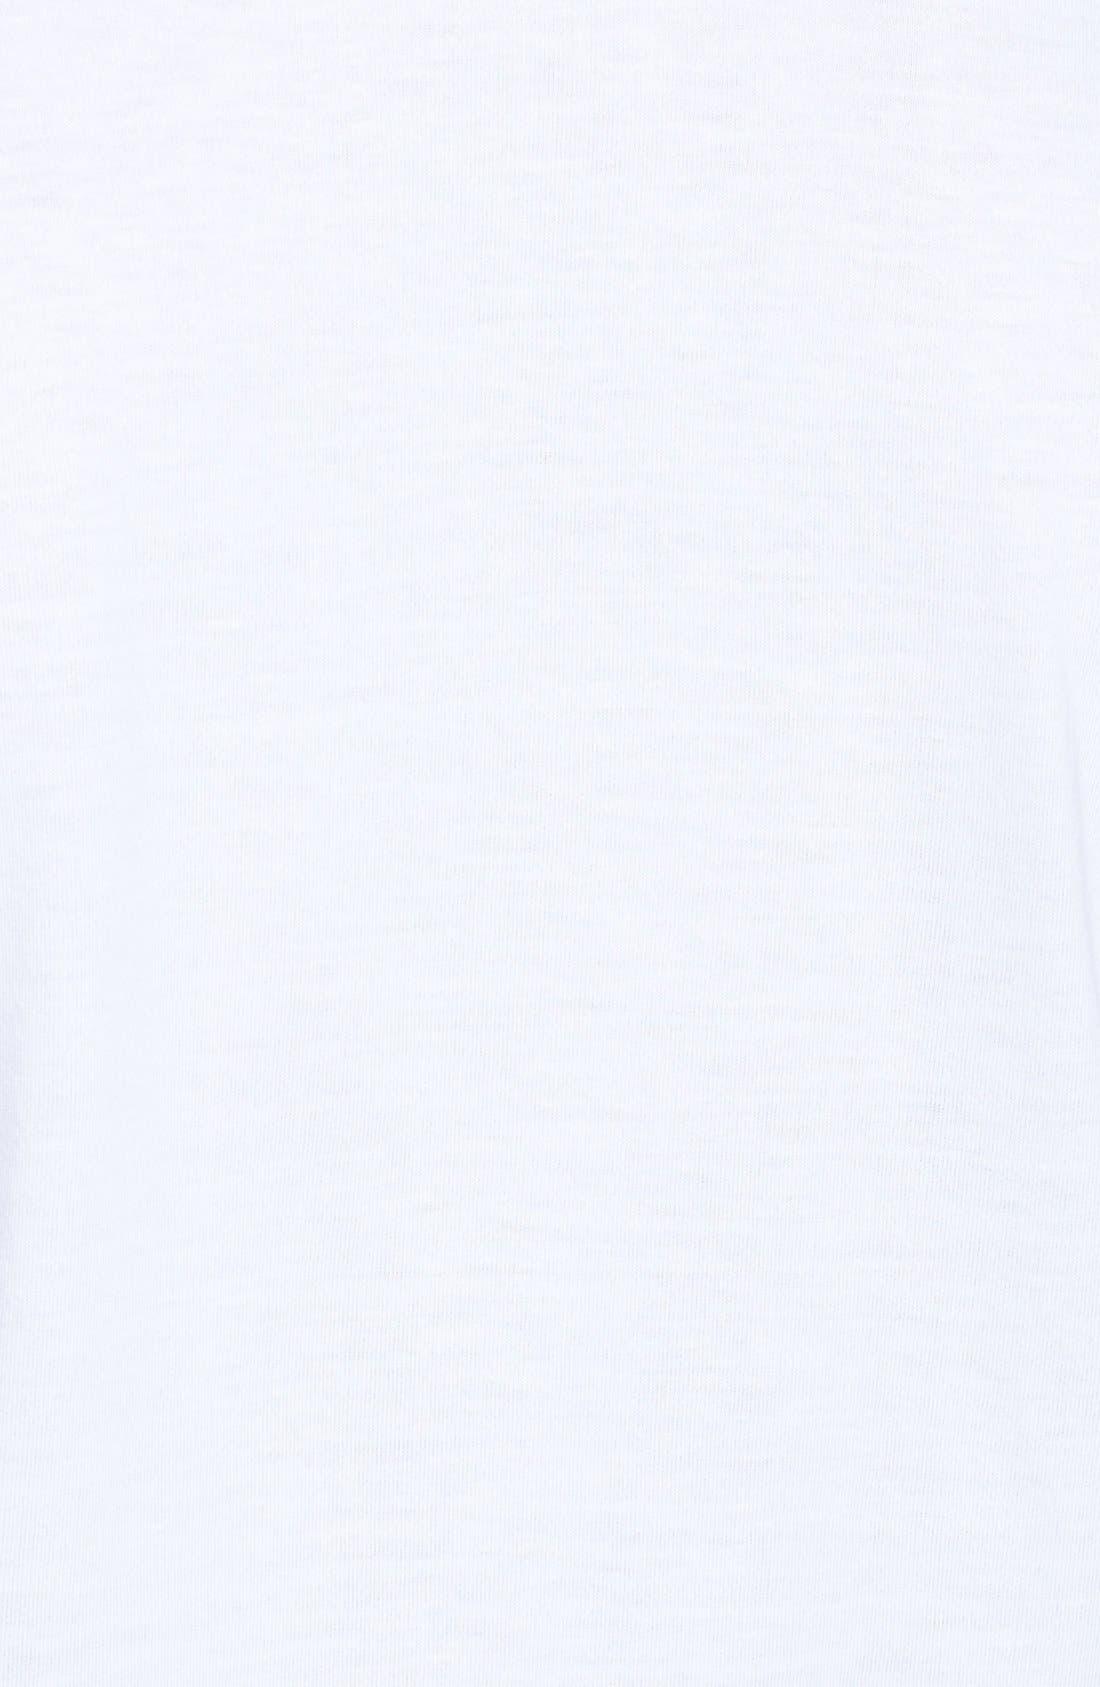 NORDSTROM MEN'S SHOP, 4-Pack Regular Fit Supima<sup>®</sup> Cotton V-Neck T-Shirts, Alternate thumbnail 8, color, WHITE